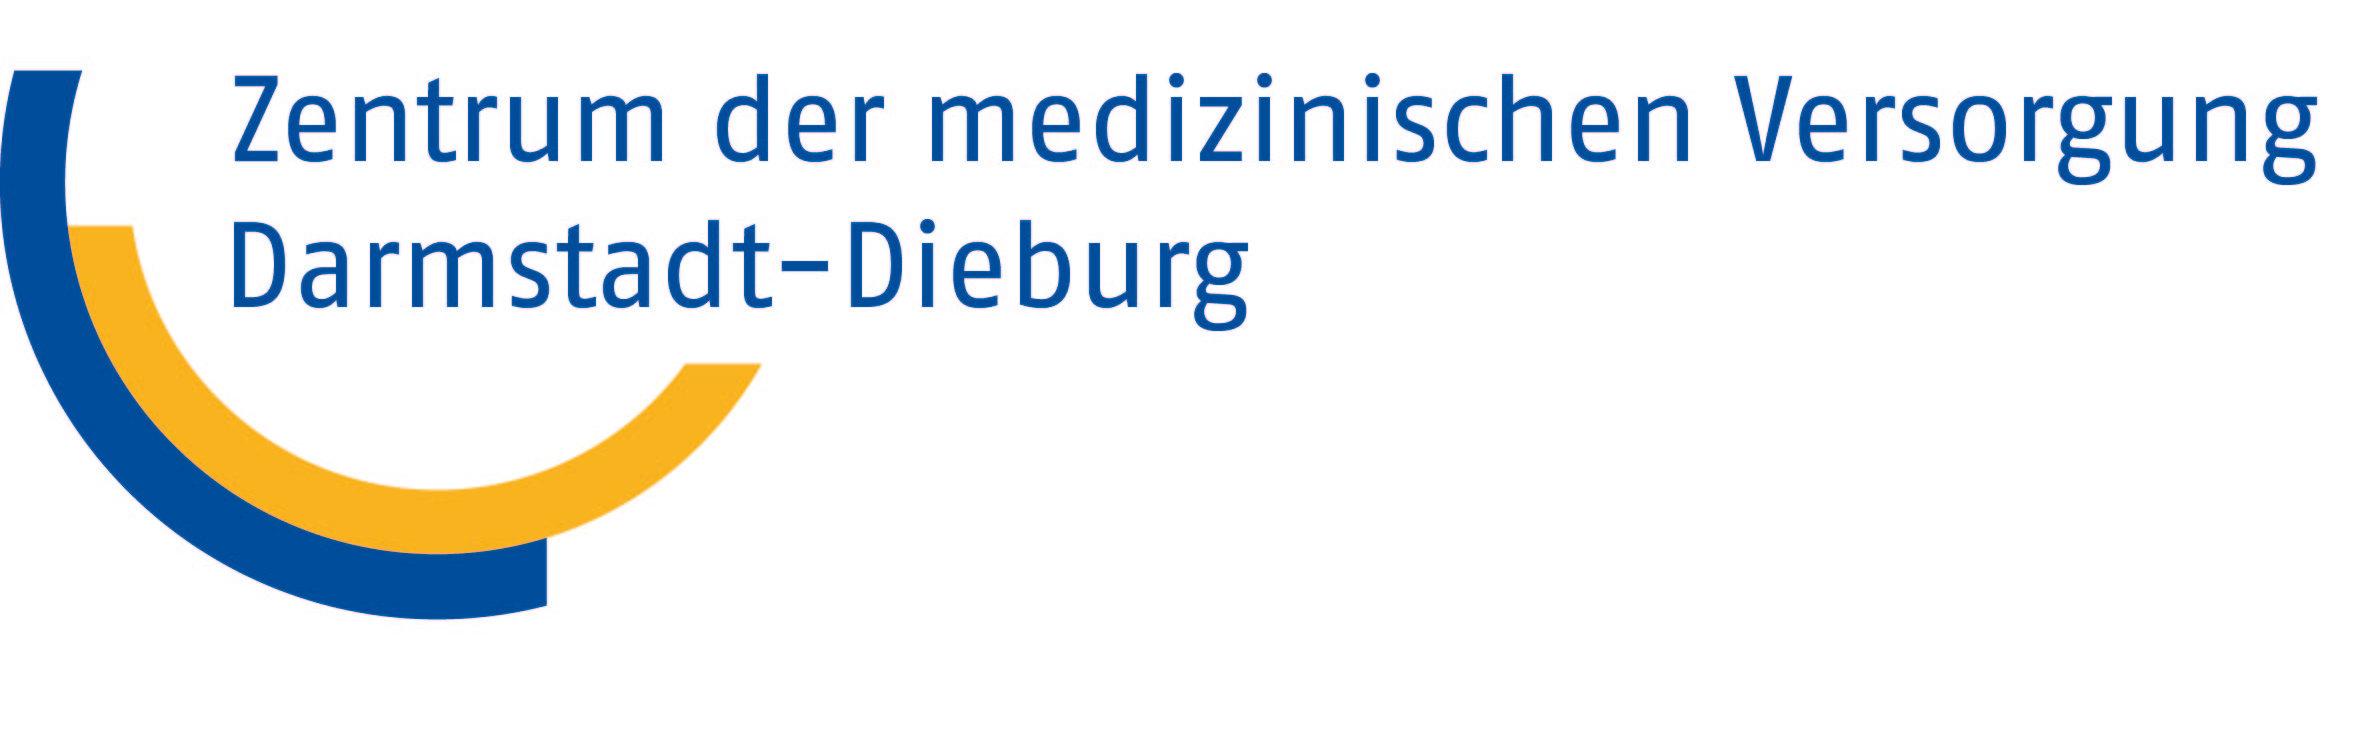 Neues MVZ in Jugenheim sichert Patientenversorgung